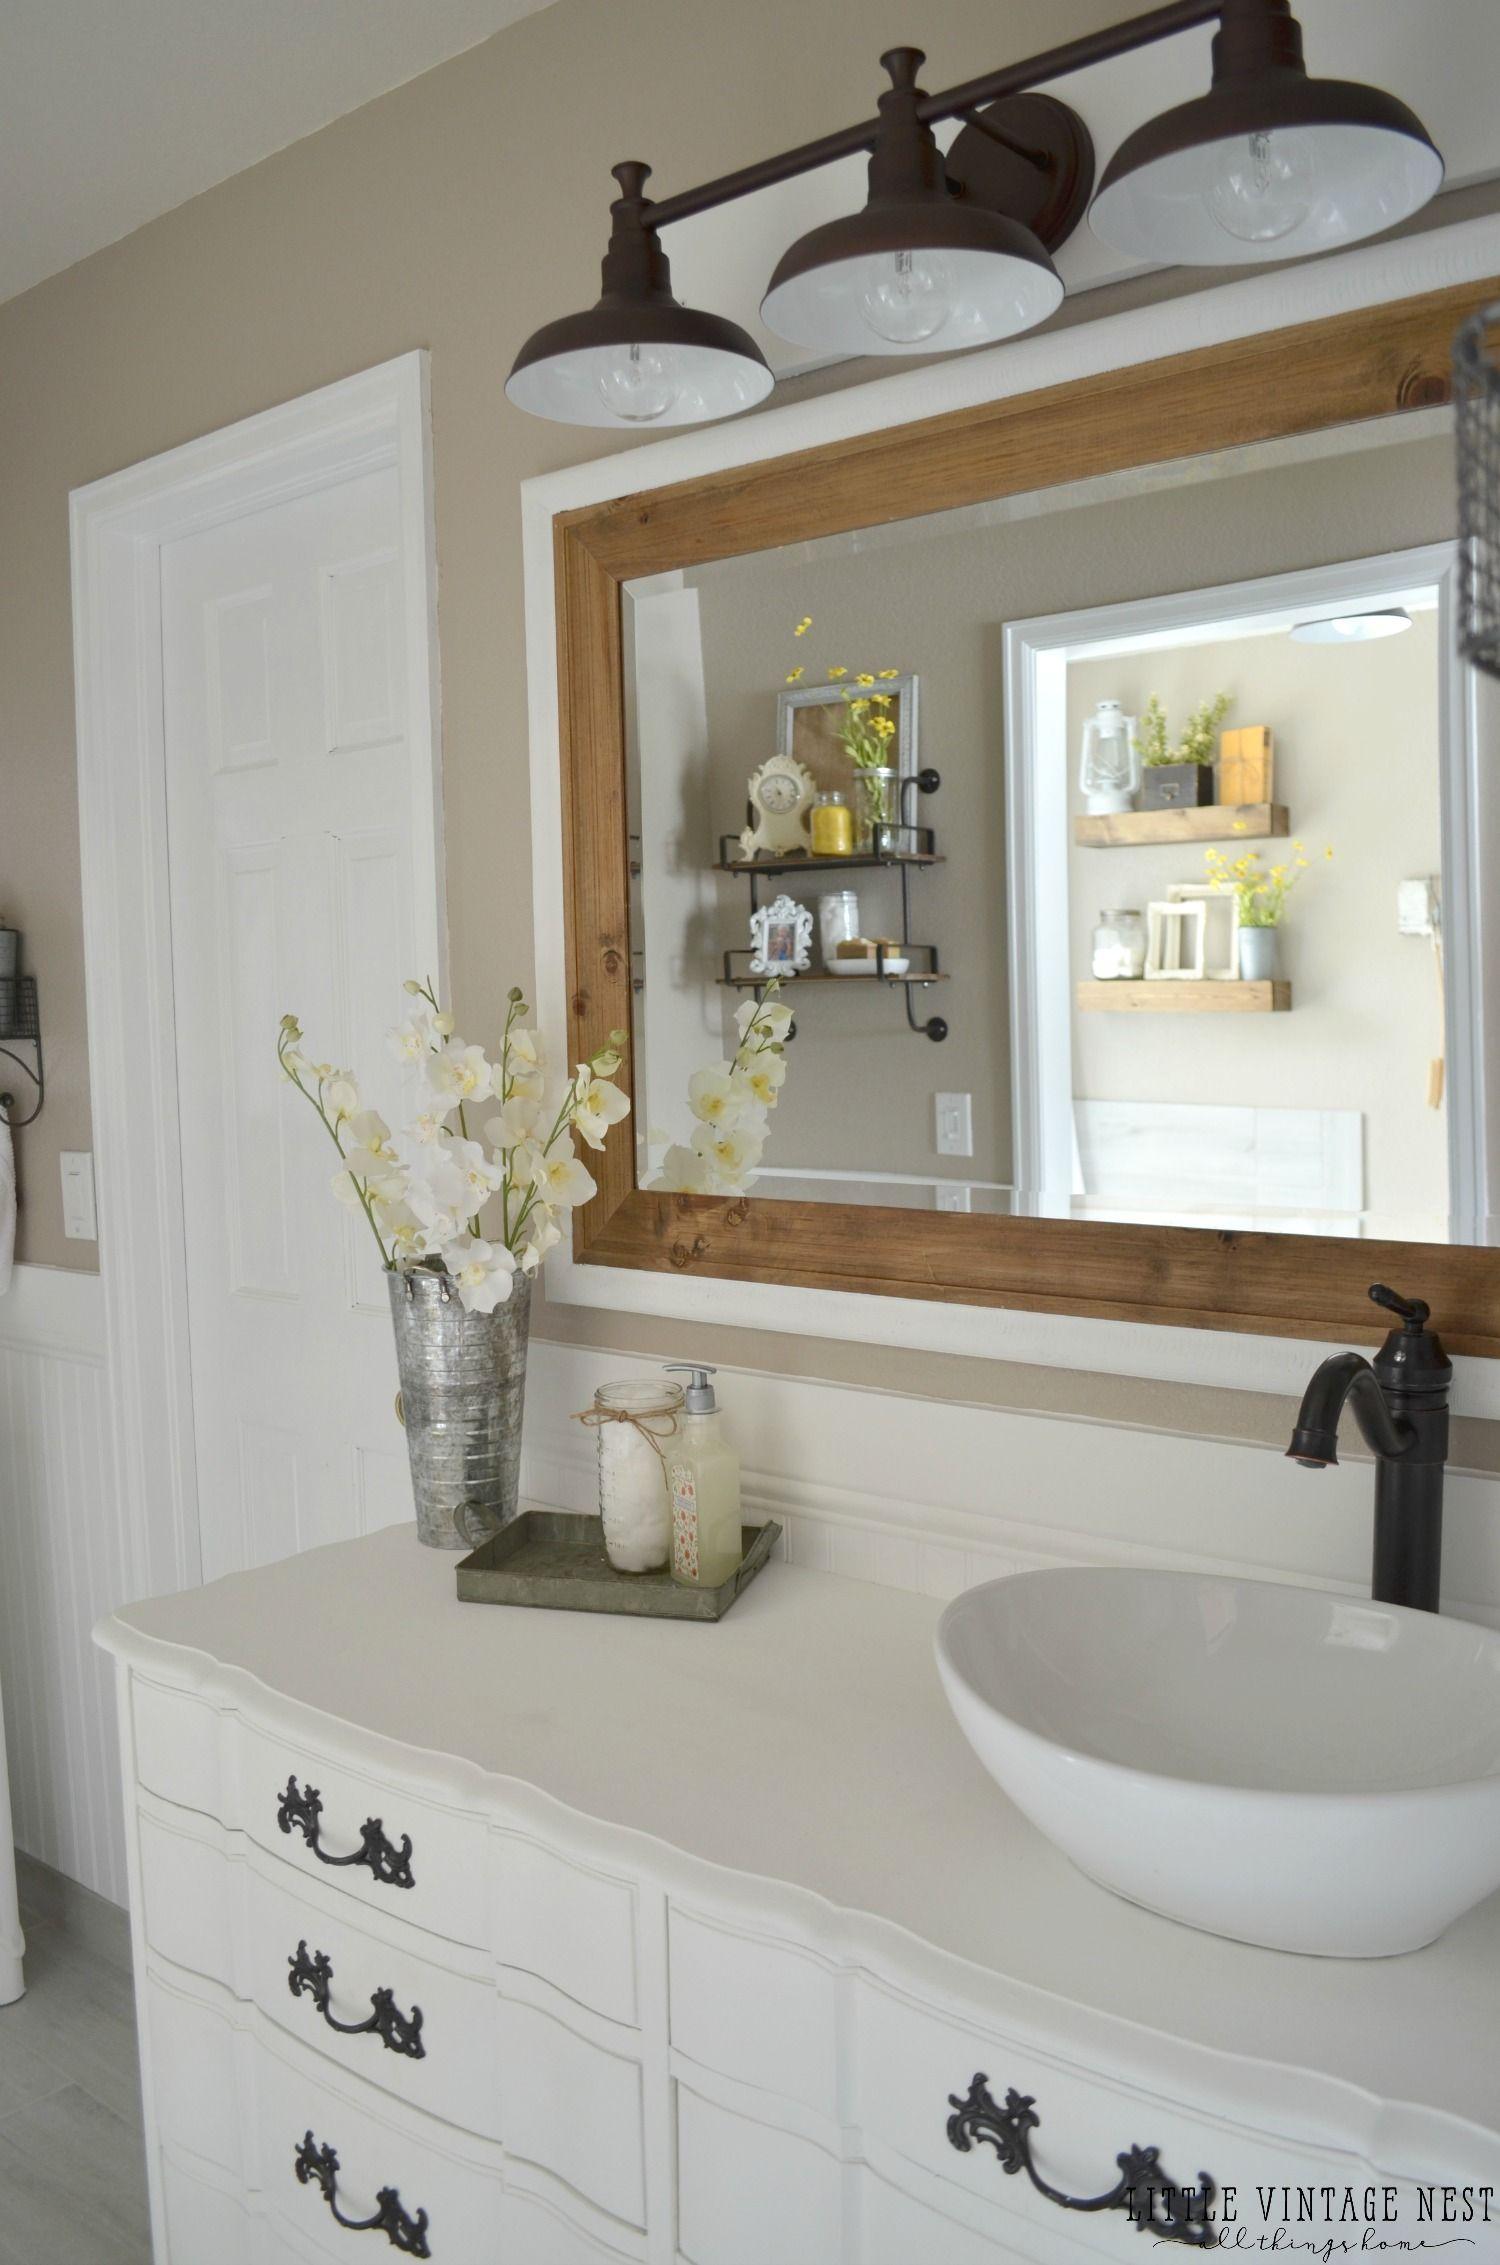 Vintage Farmhouse Master Bathroom With Images Bathroom Remodel